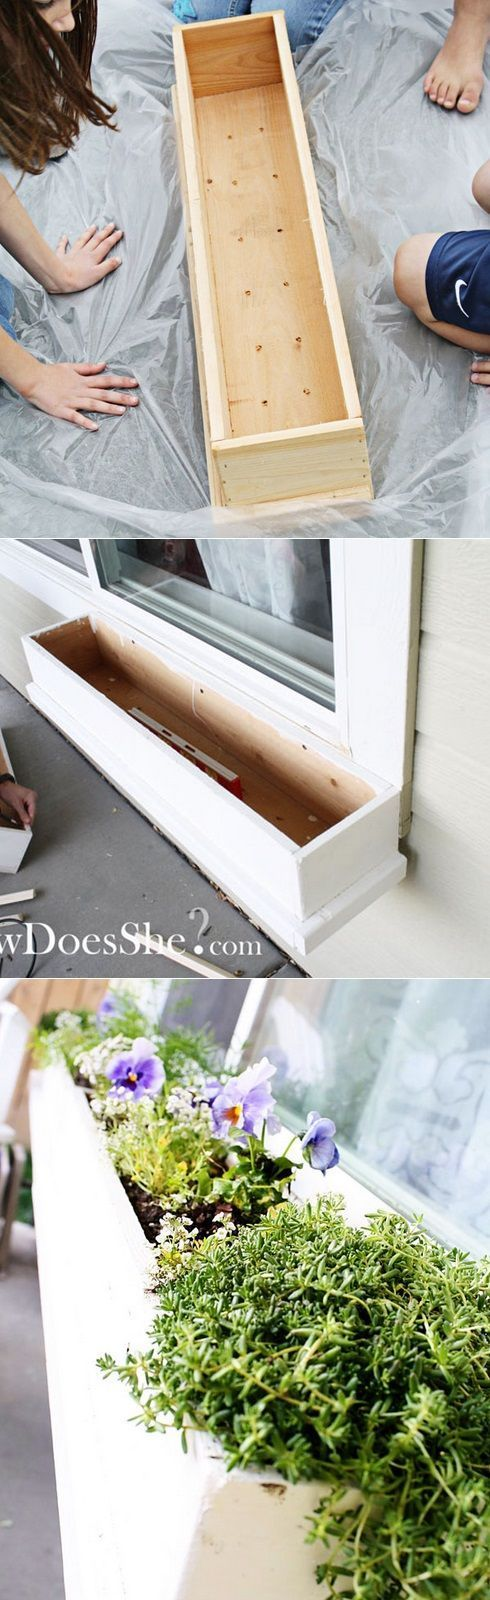 101 Gardening: How to make a gorgeous window box